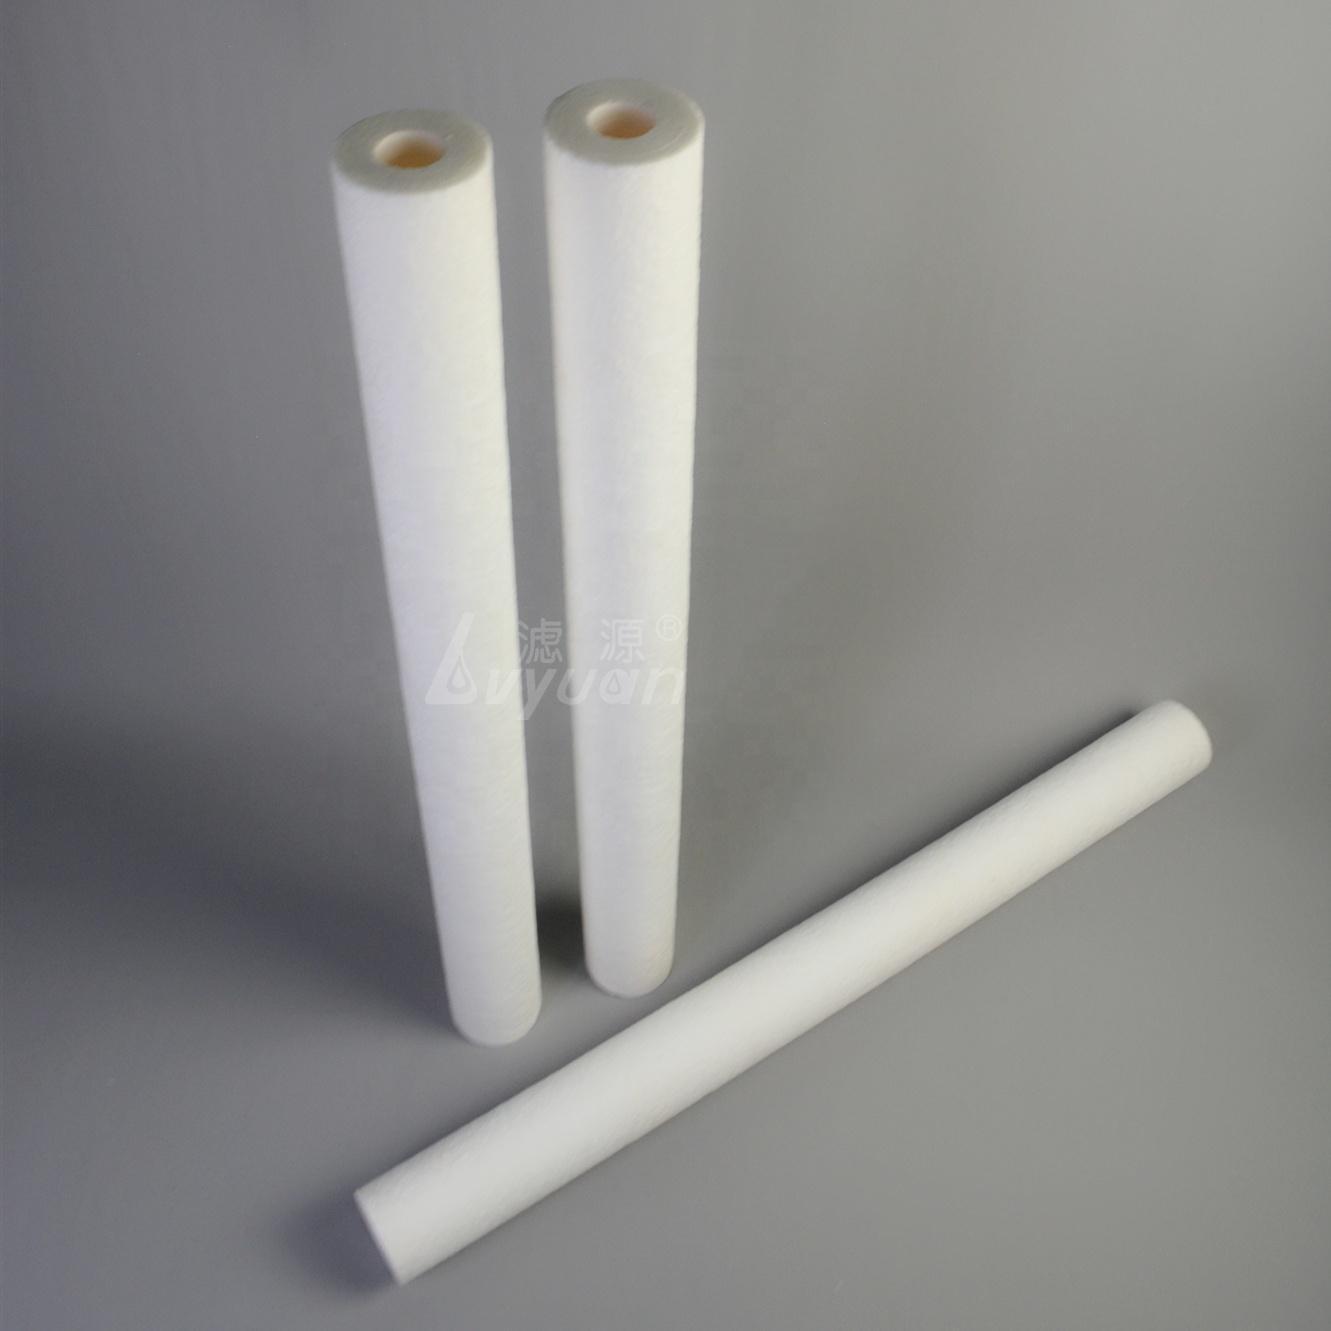 1 box/25pcs High Flow 40 inch 5 micron pp sediment filter cartridge /melt blown cartridge filter water